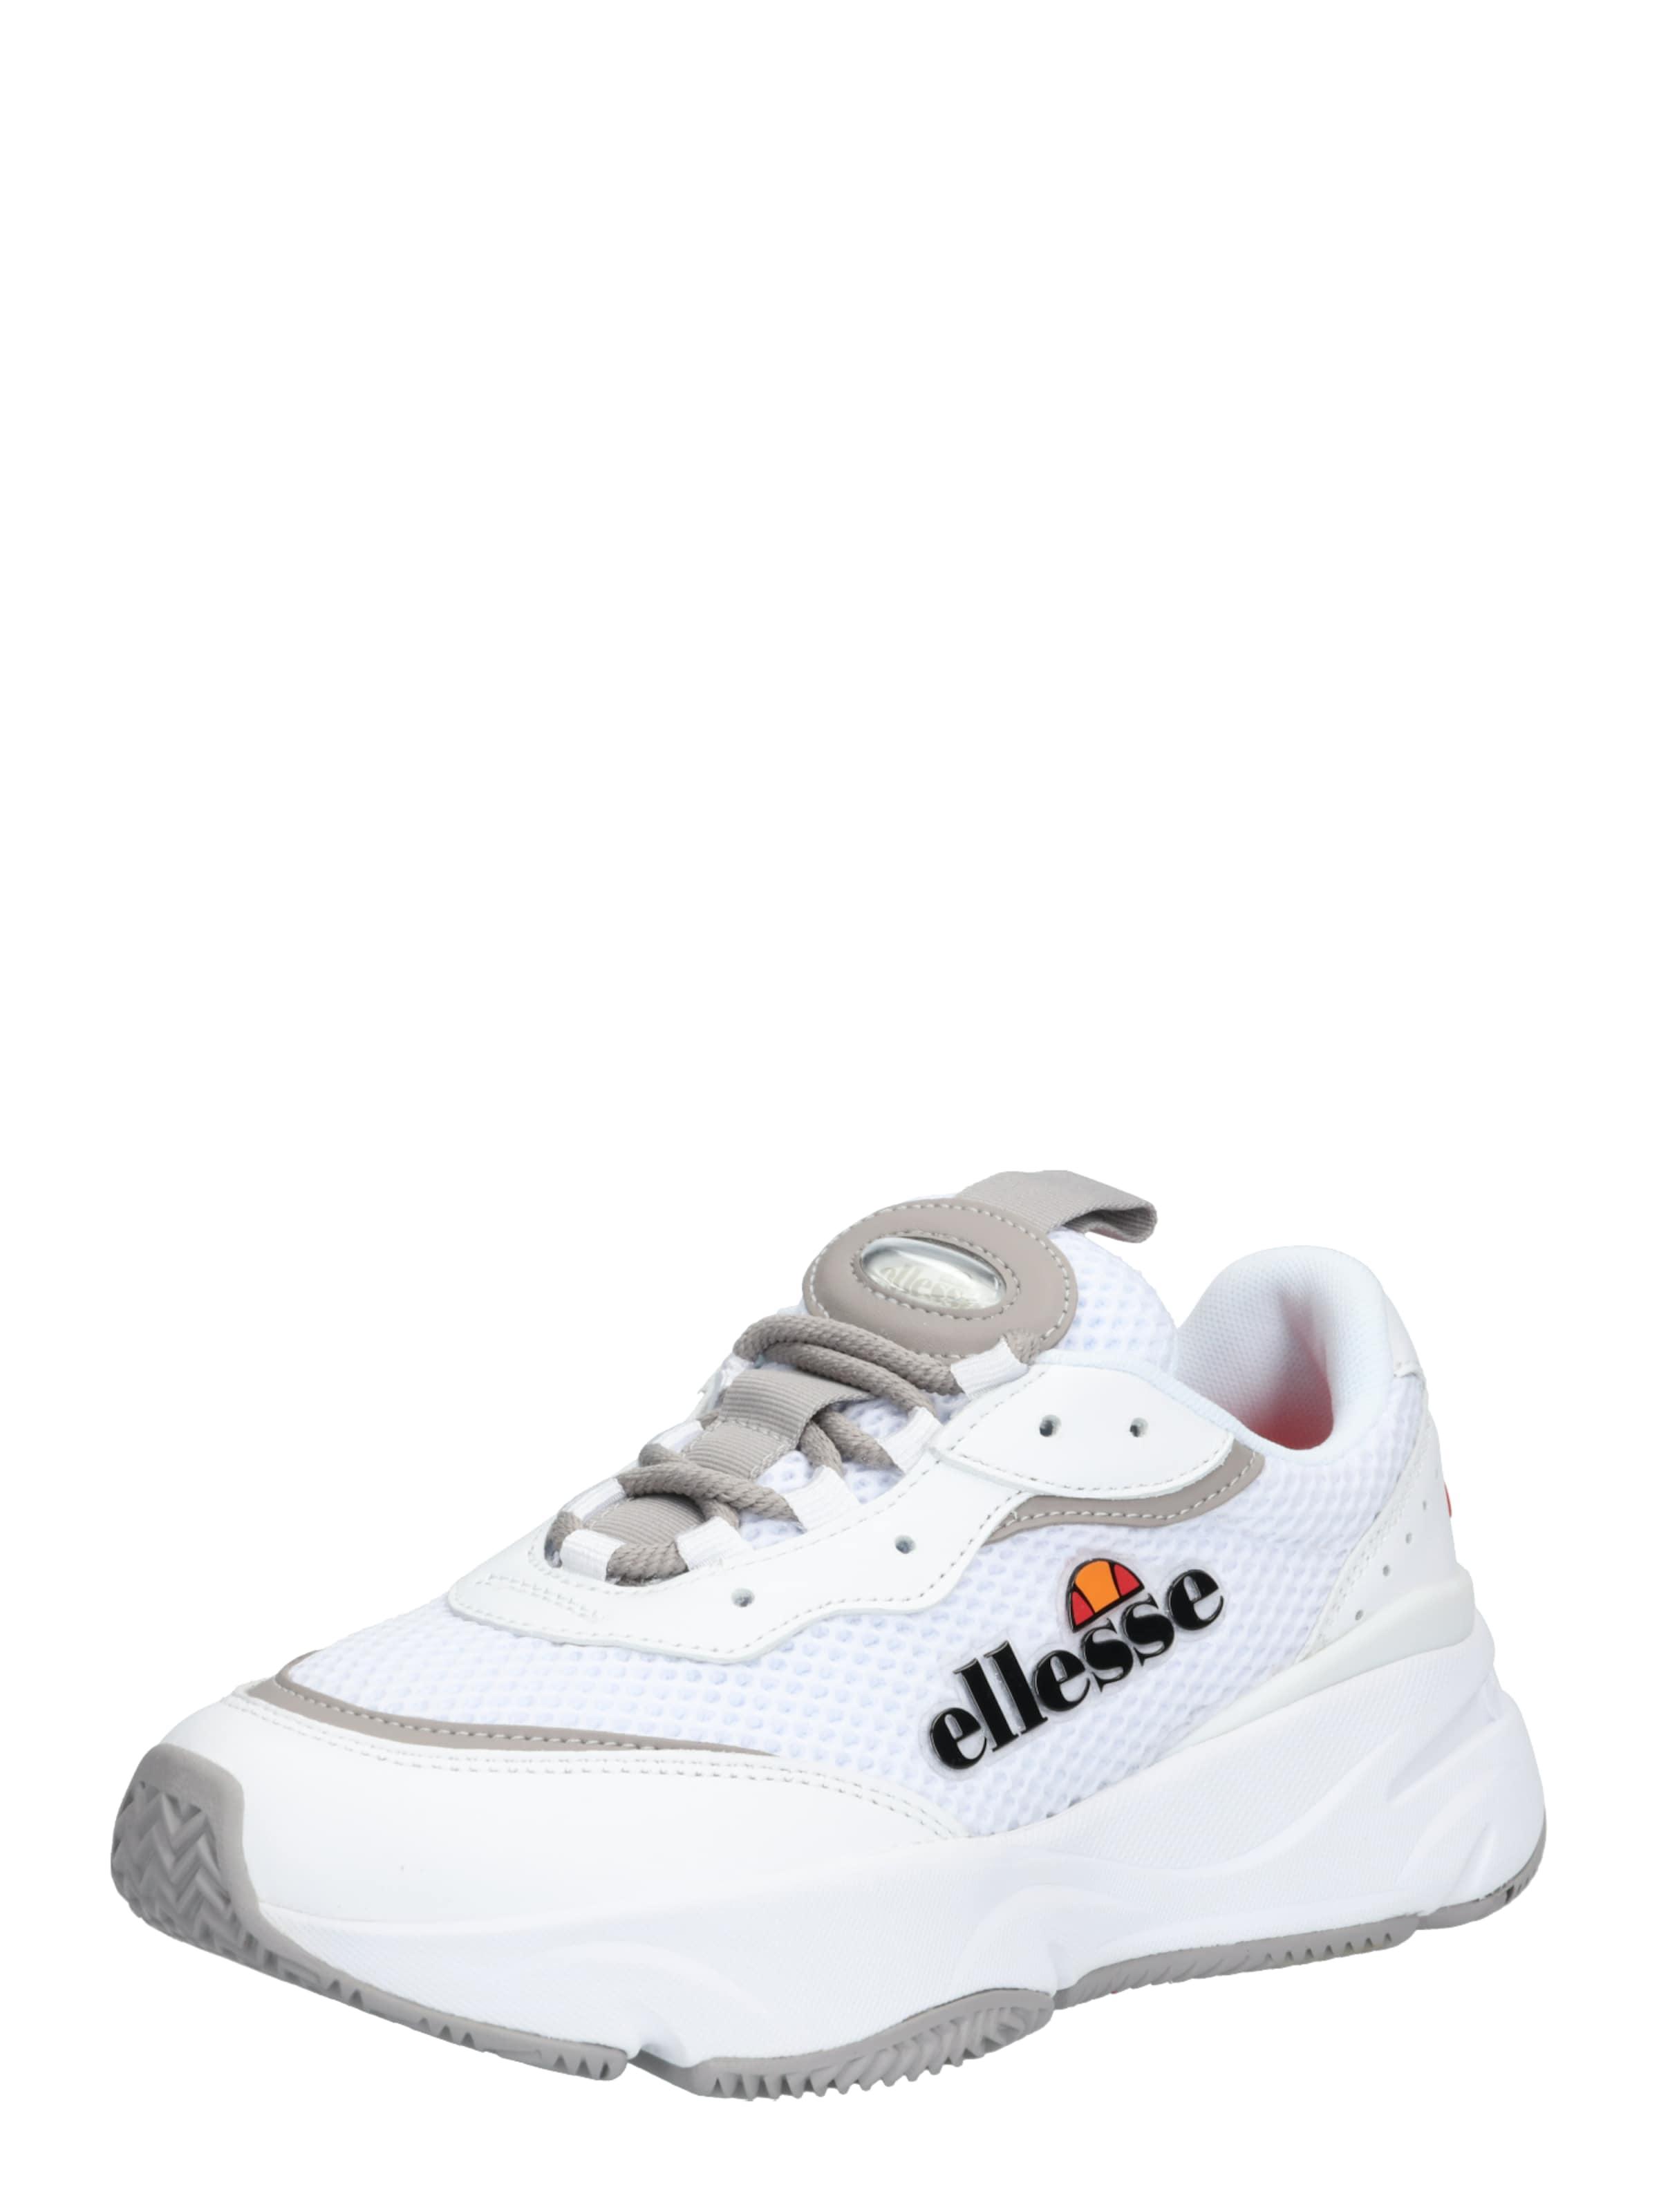 Blanc Ellesse Basses Baskets En Ellesse CtdxhrsQ